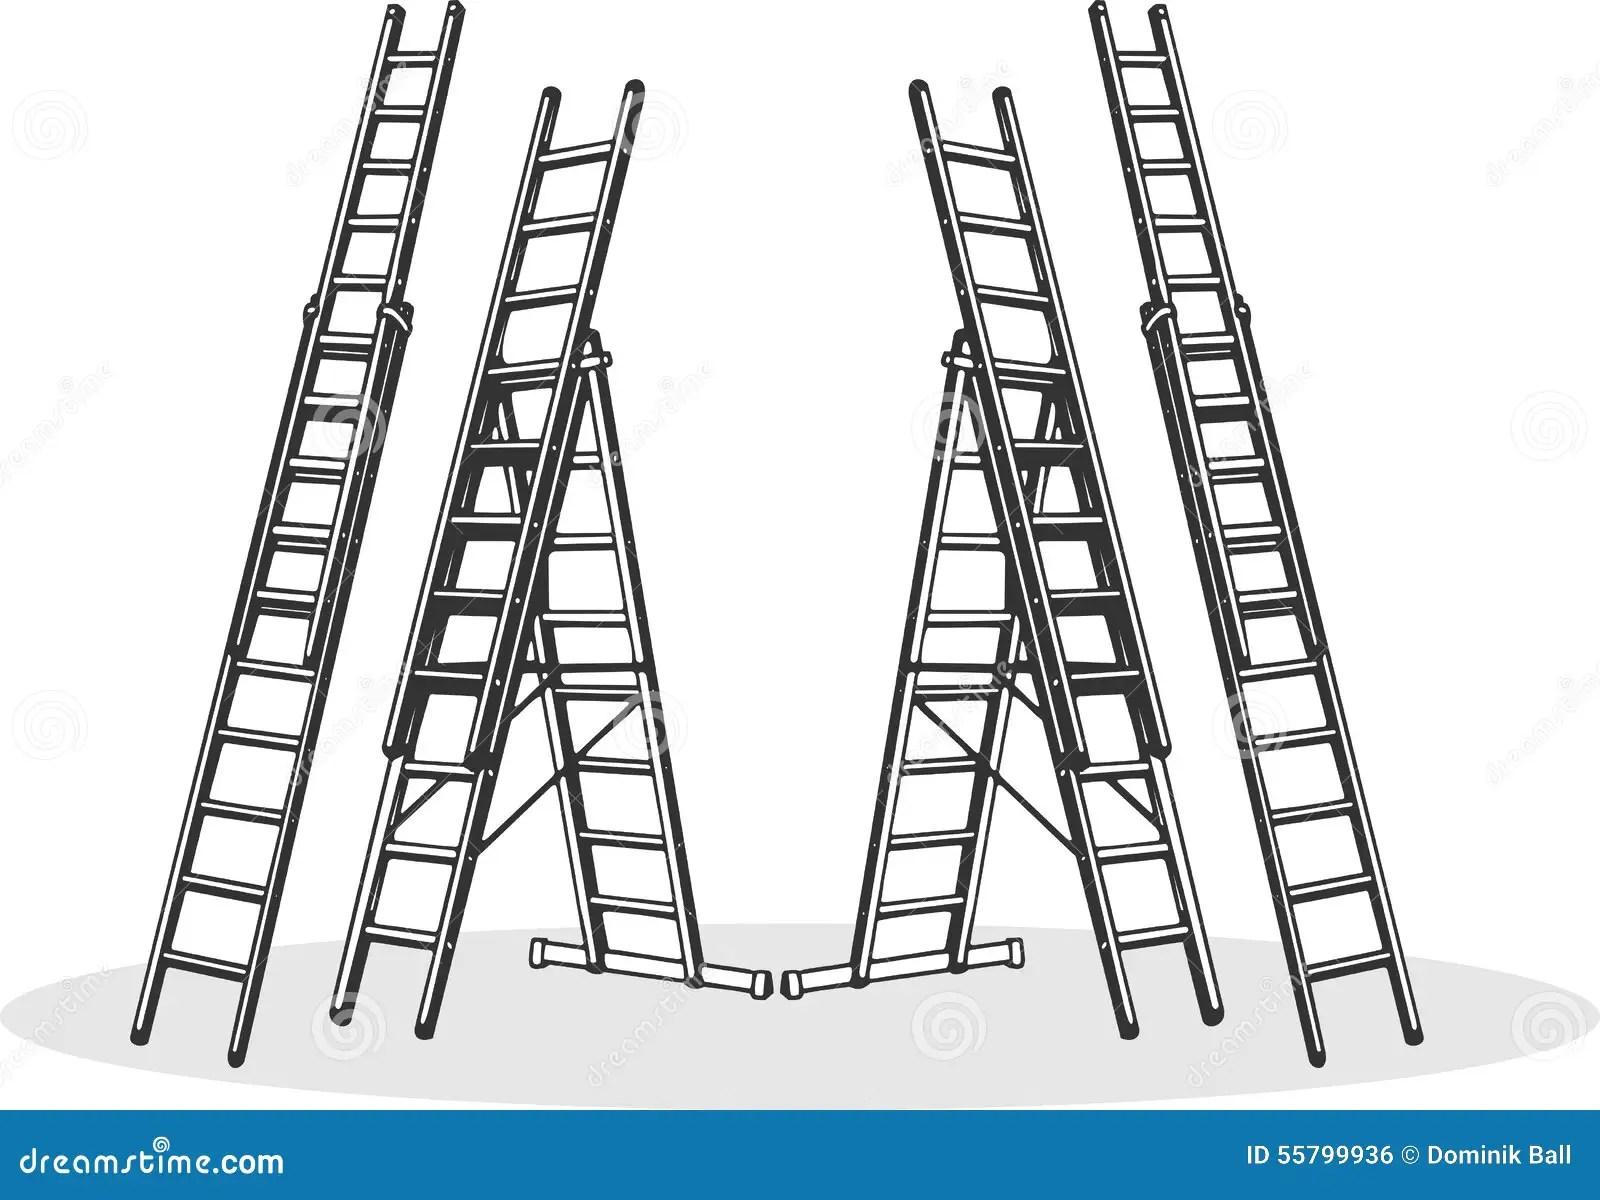 Aluminum Ladders Stock Vector